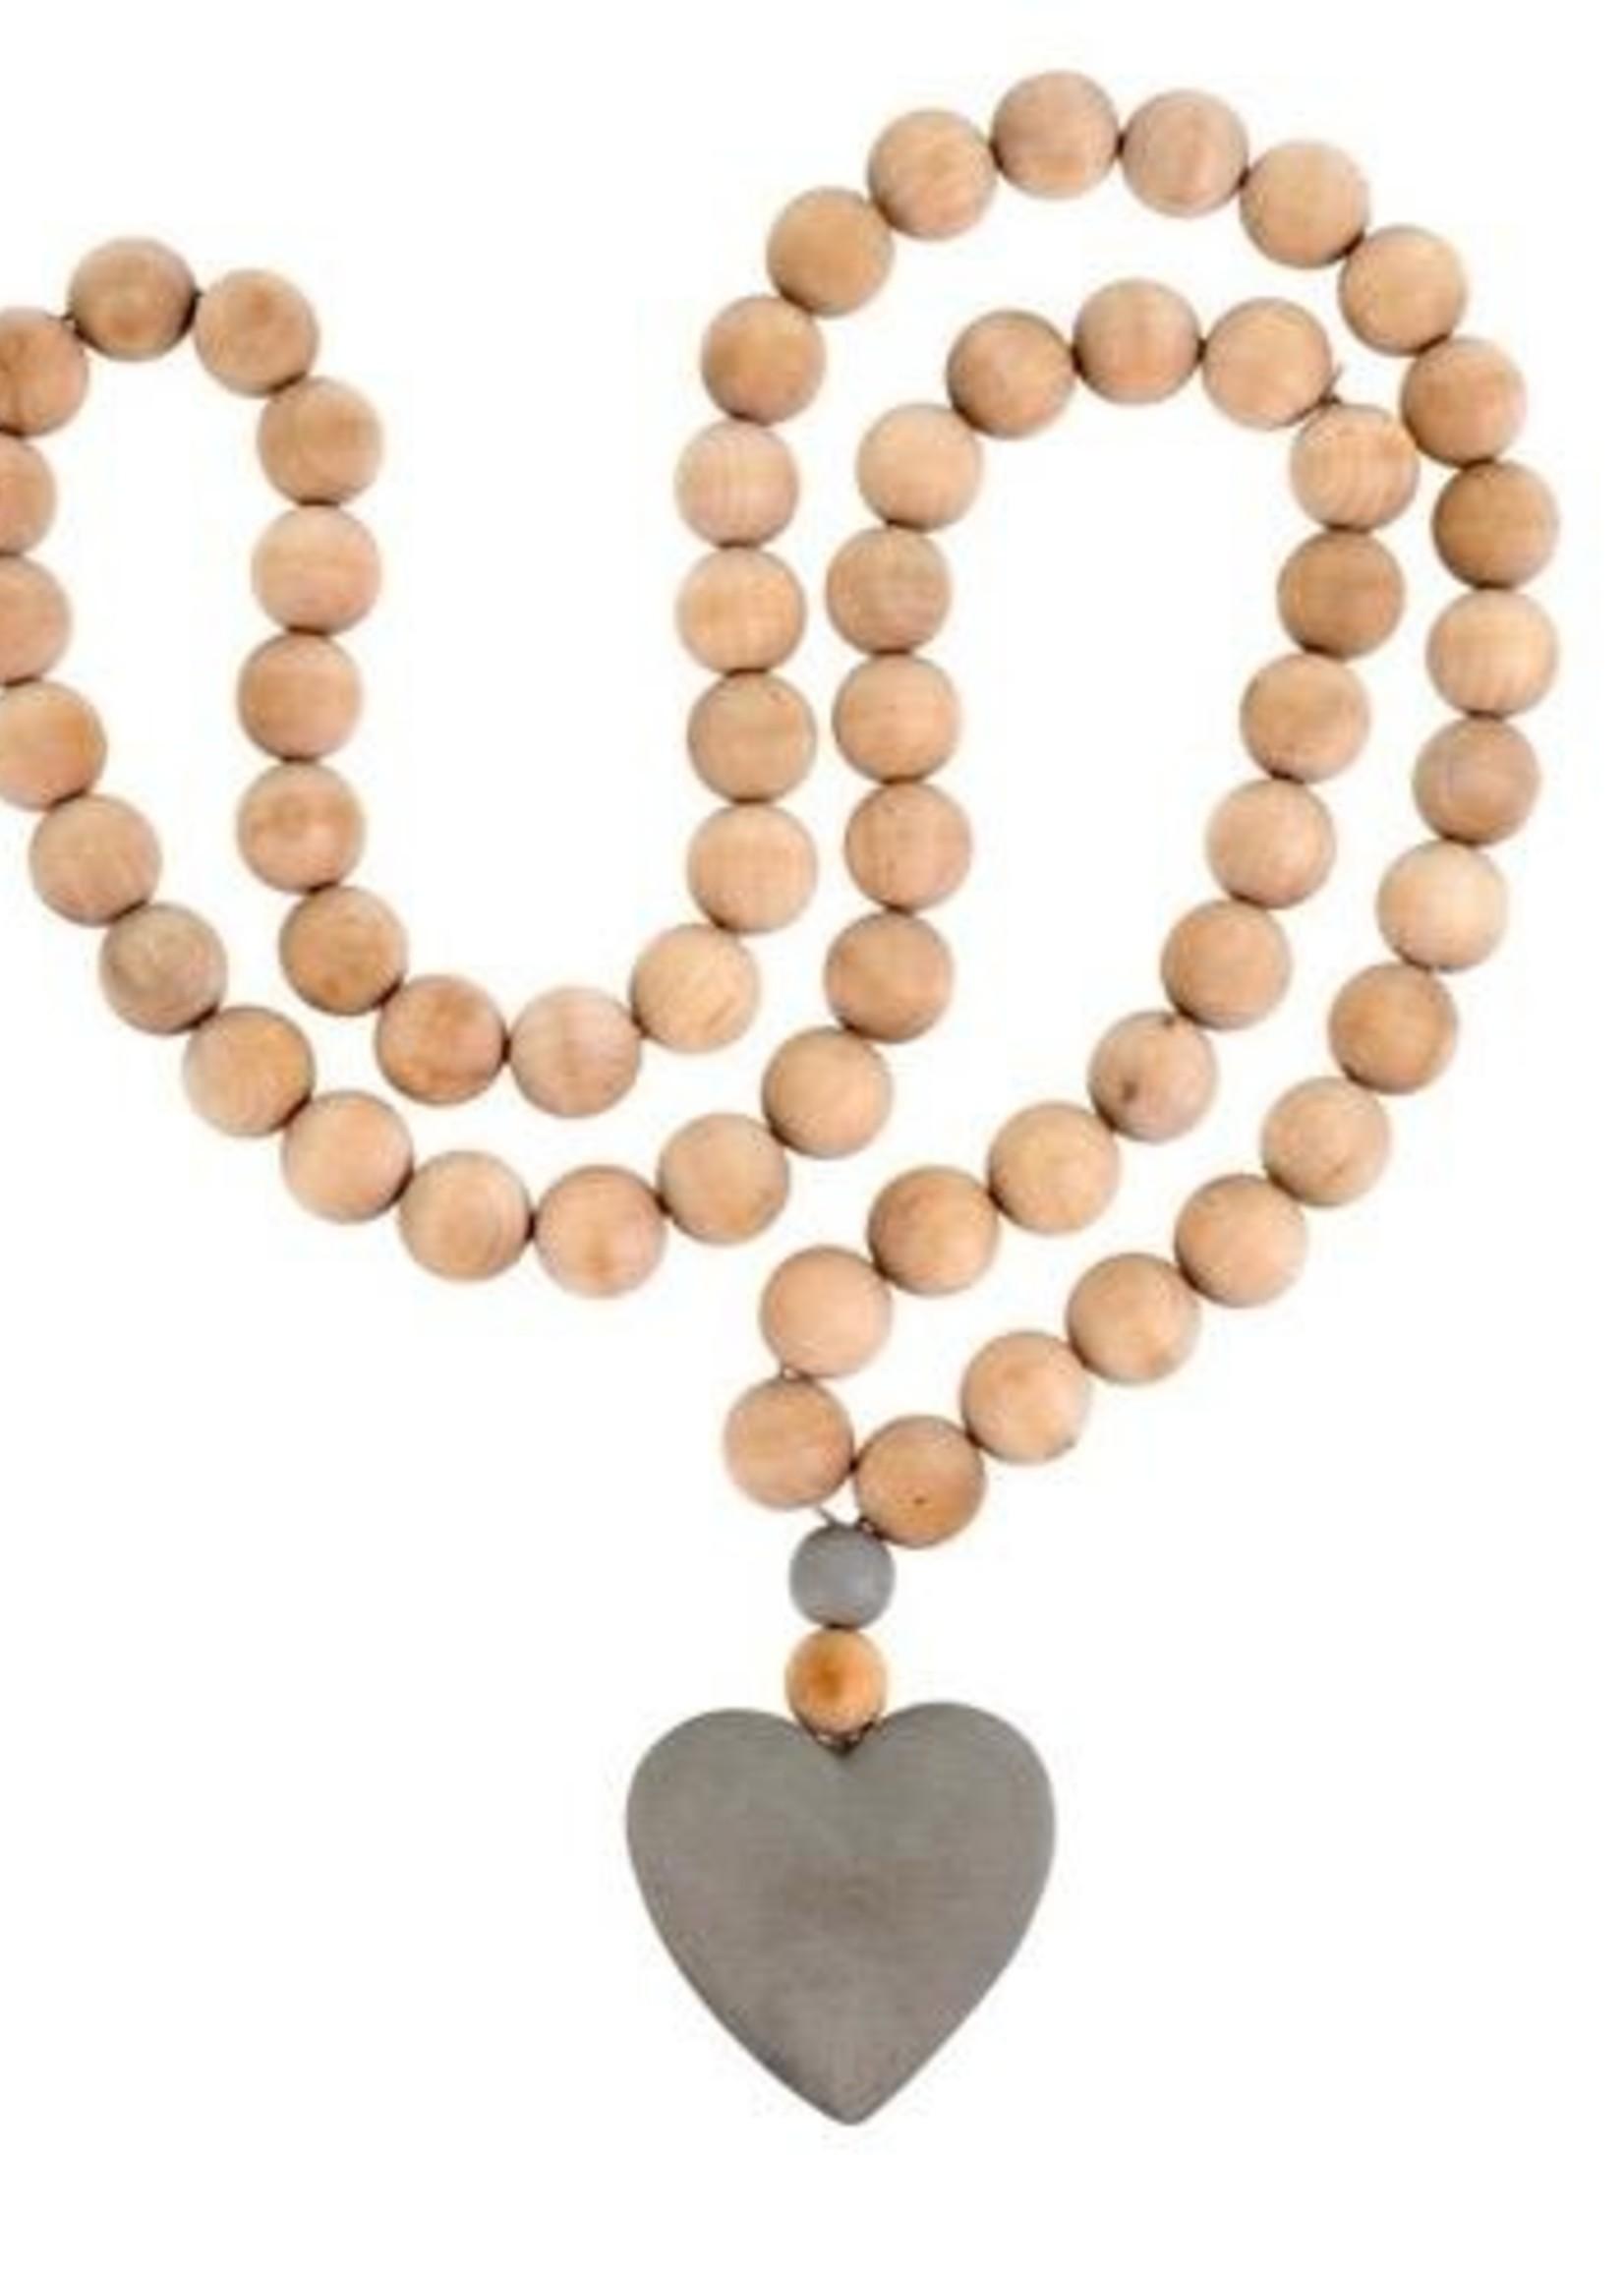 Indaba Trading Co Prayer Beads - XL